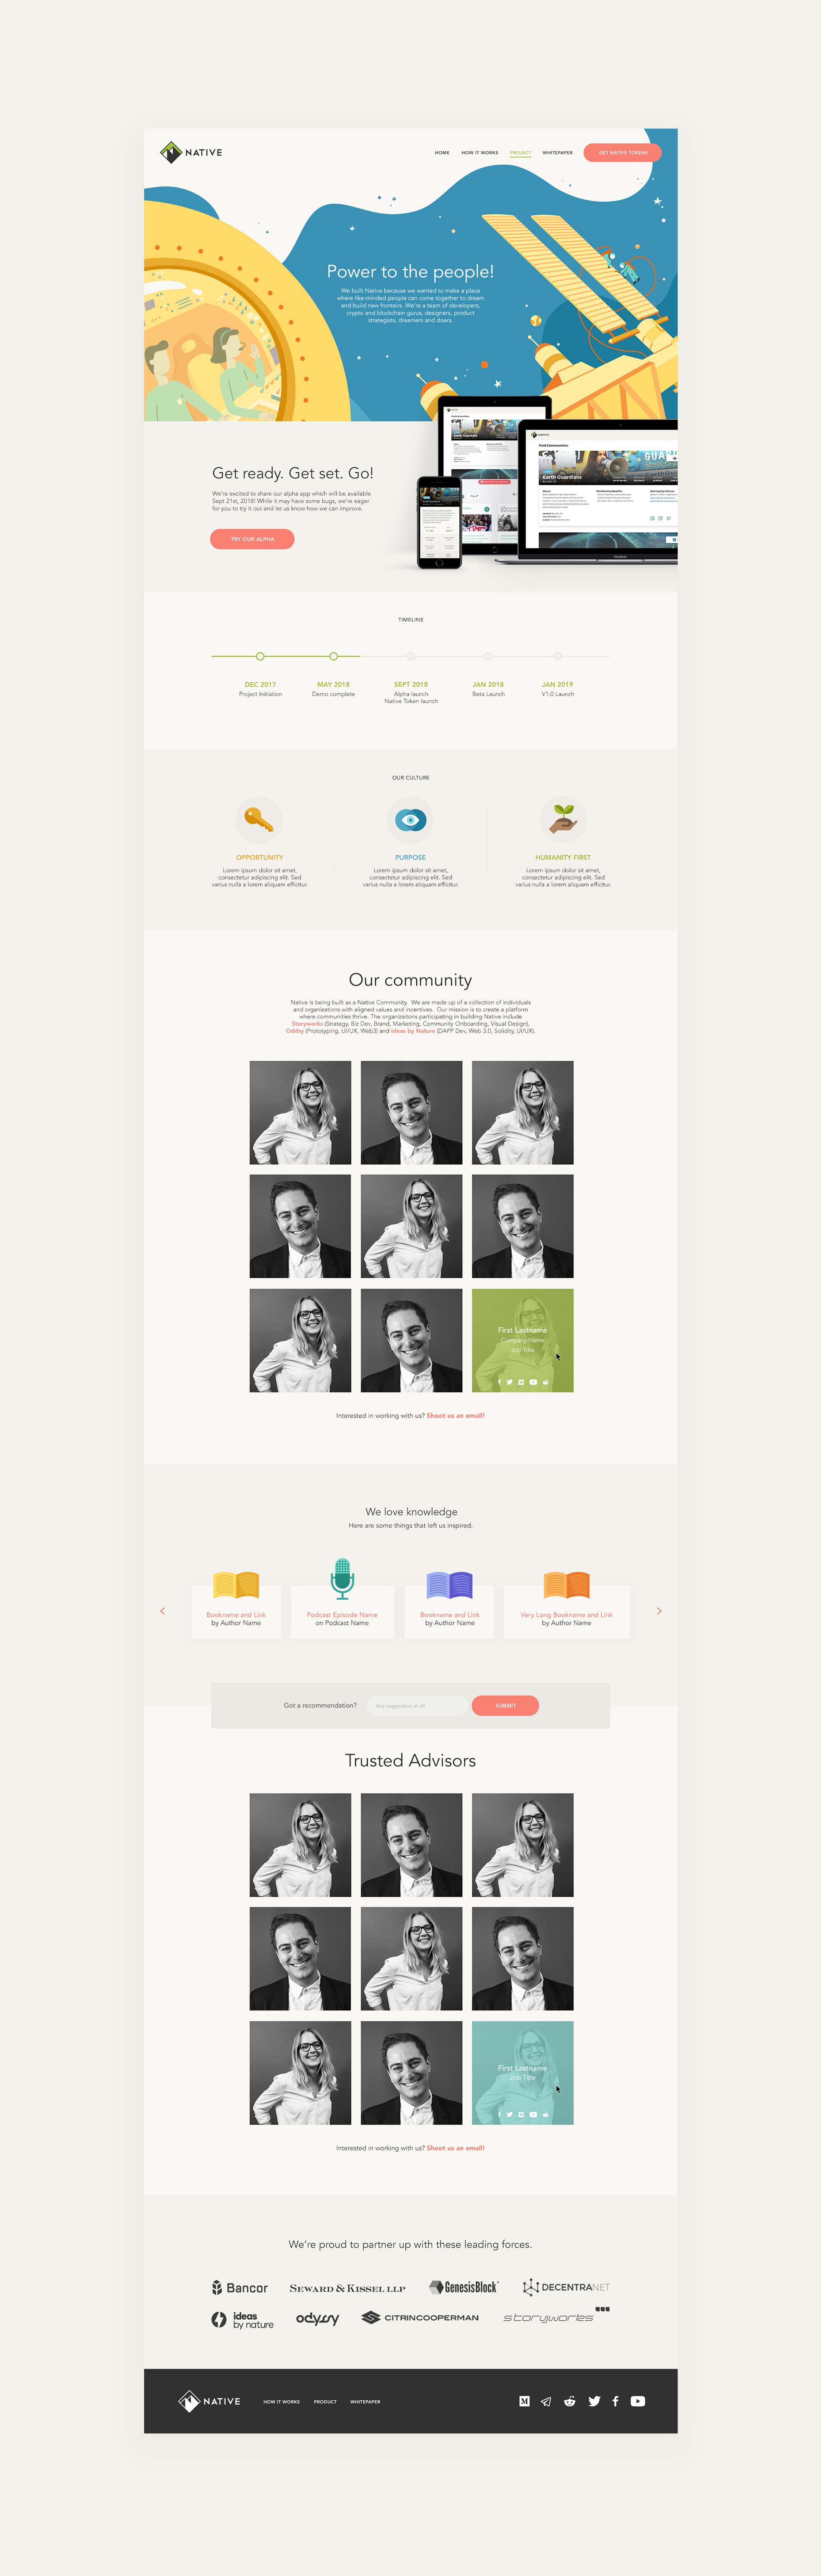 Native_brandidentity_websitedesign_julieeckertdesign_10.jpg